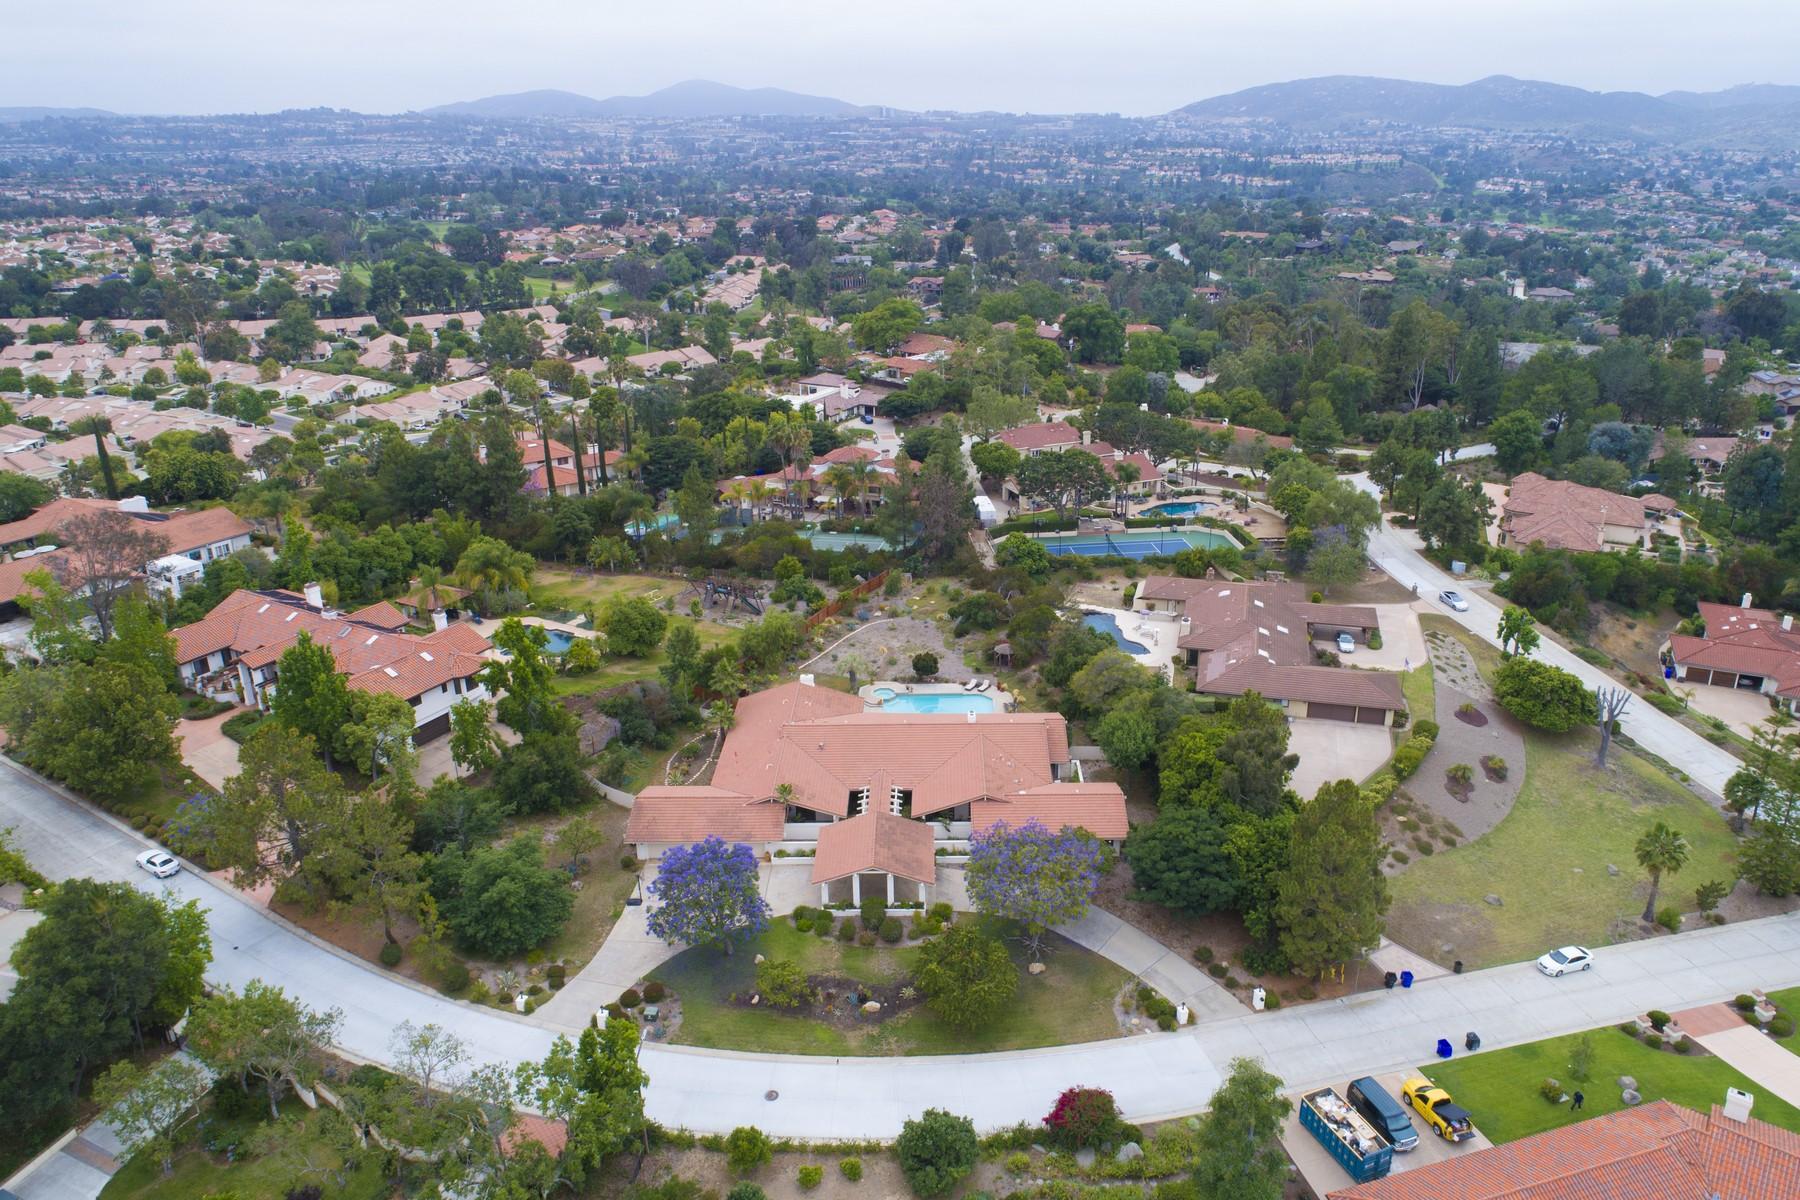 Single Family Home for Sale at 18676 Avenida Cordillera San Diego, California, 92128 United States